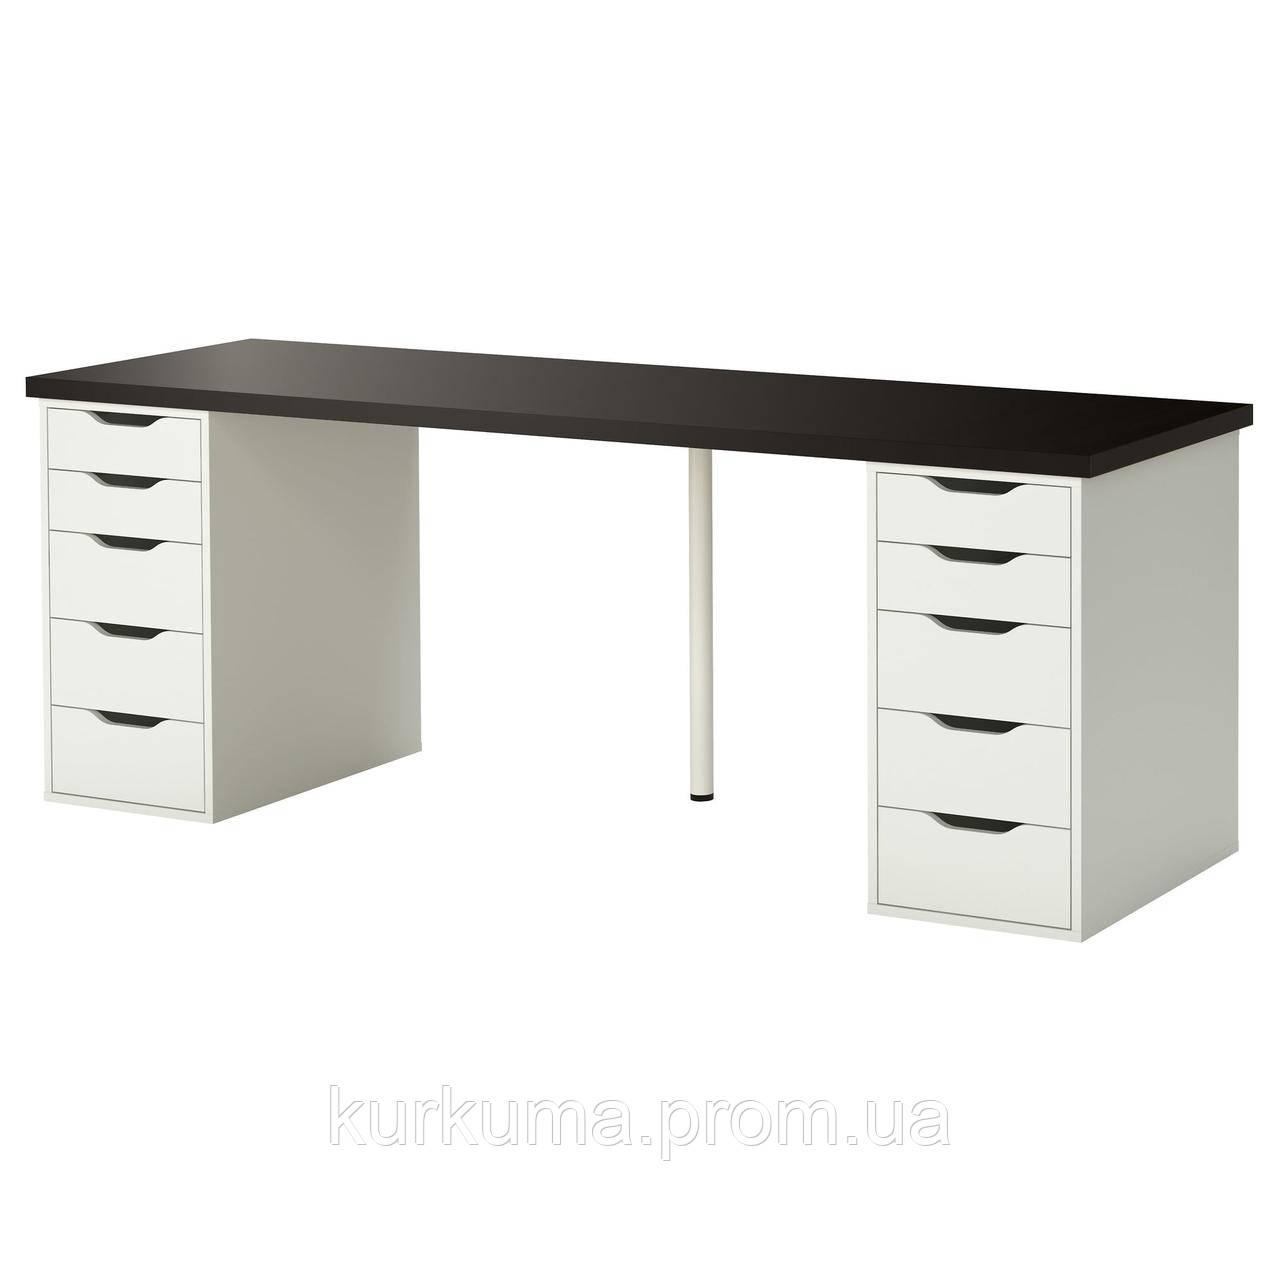 IKEA LINNMON/ALEX Стол, черно-коричневый, белый  (999.326.96)